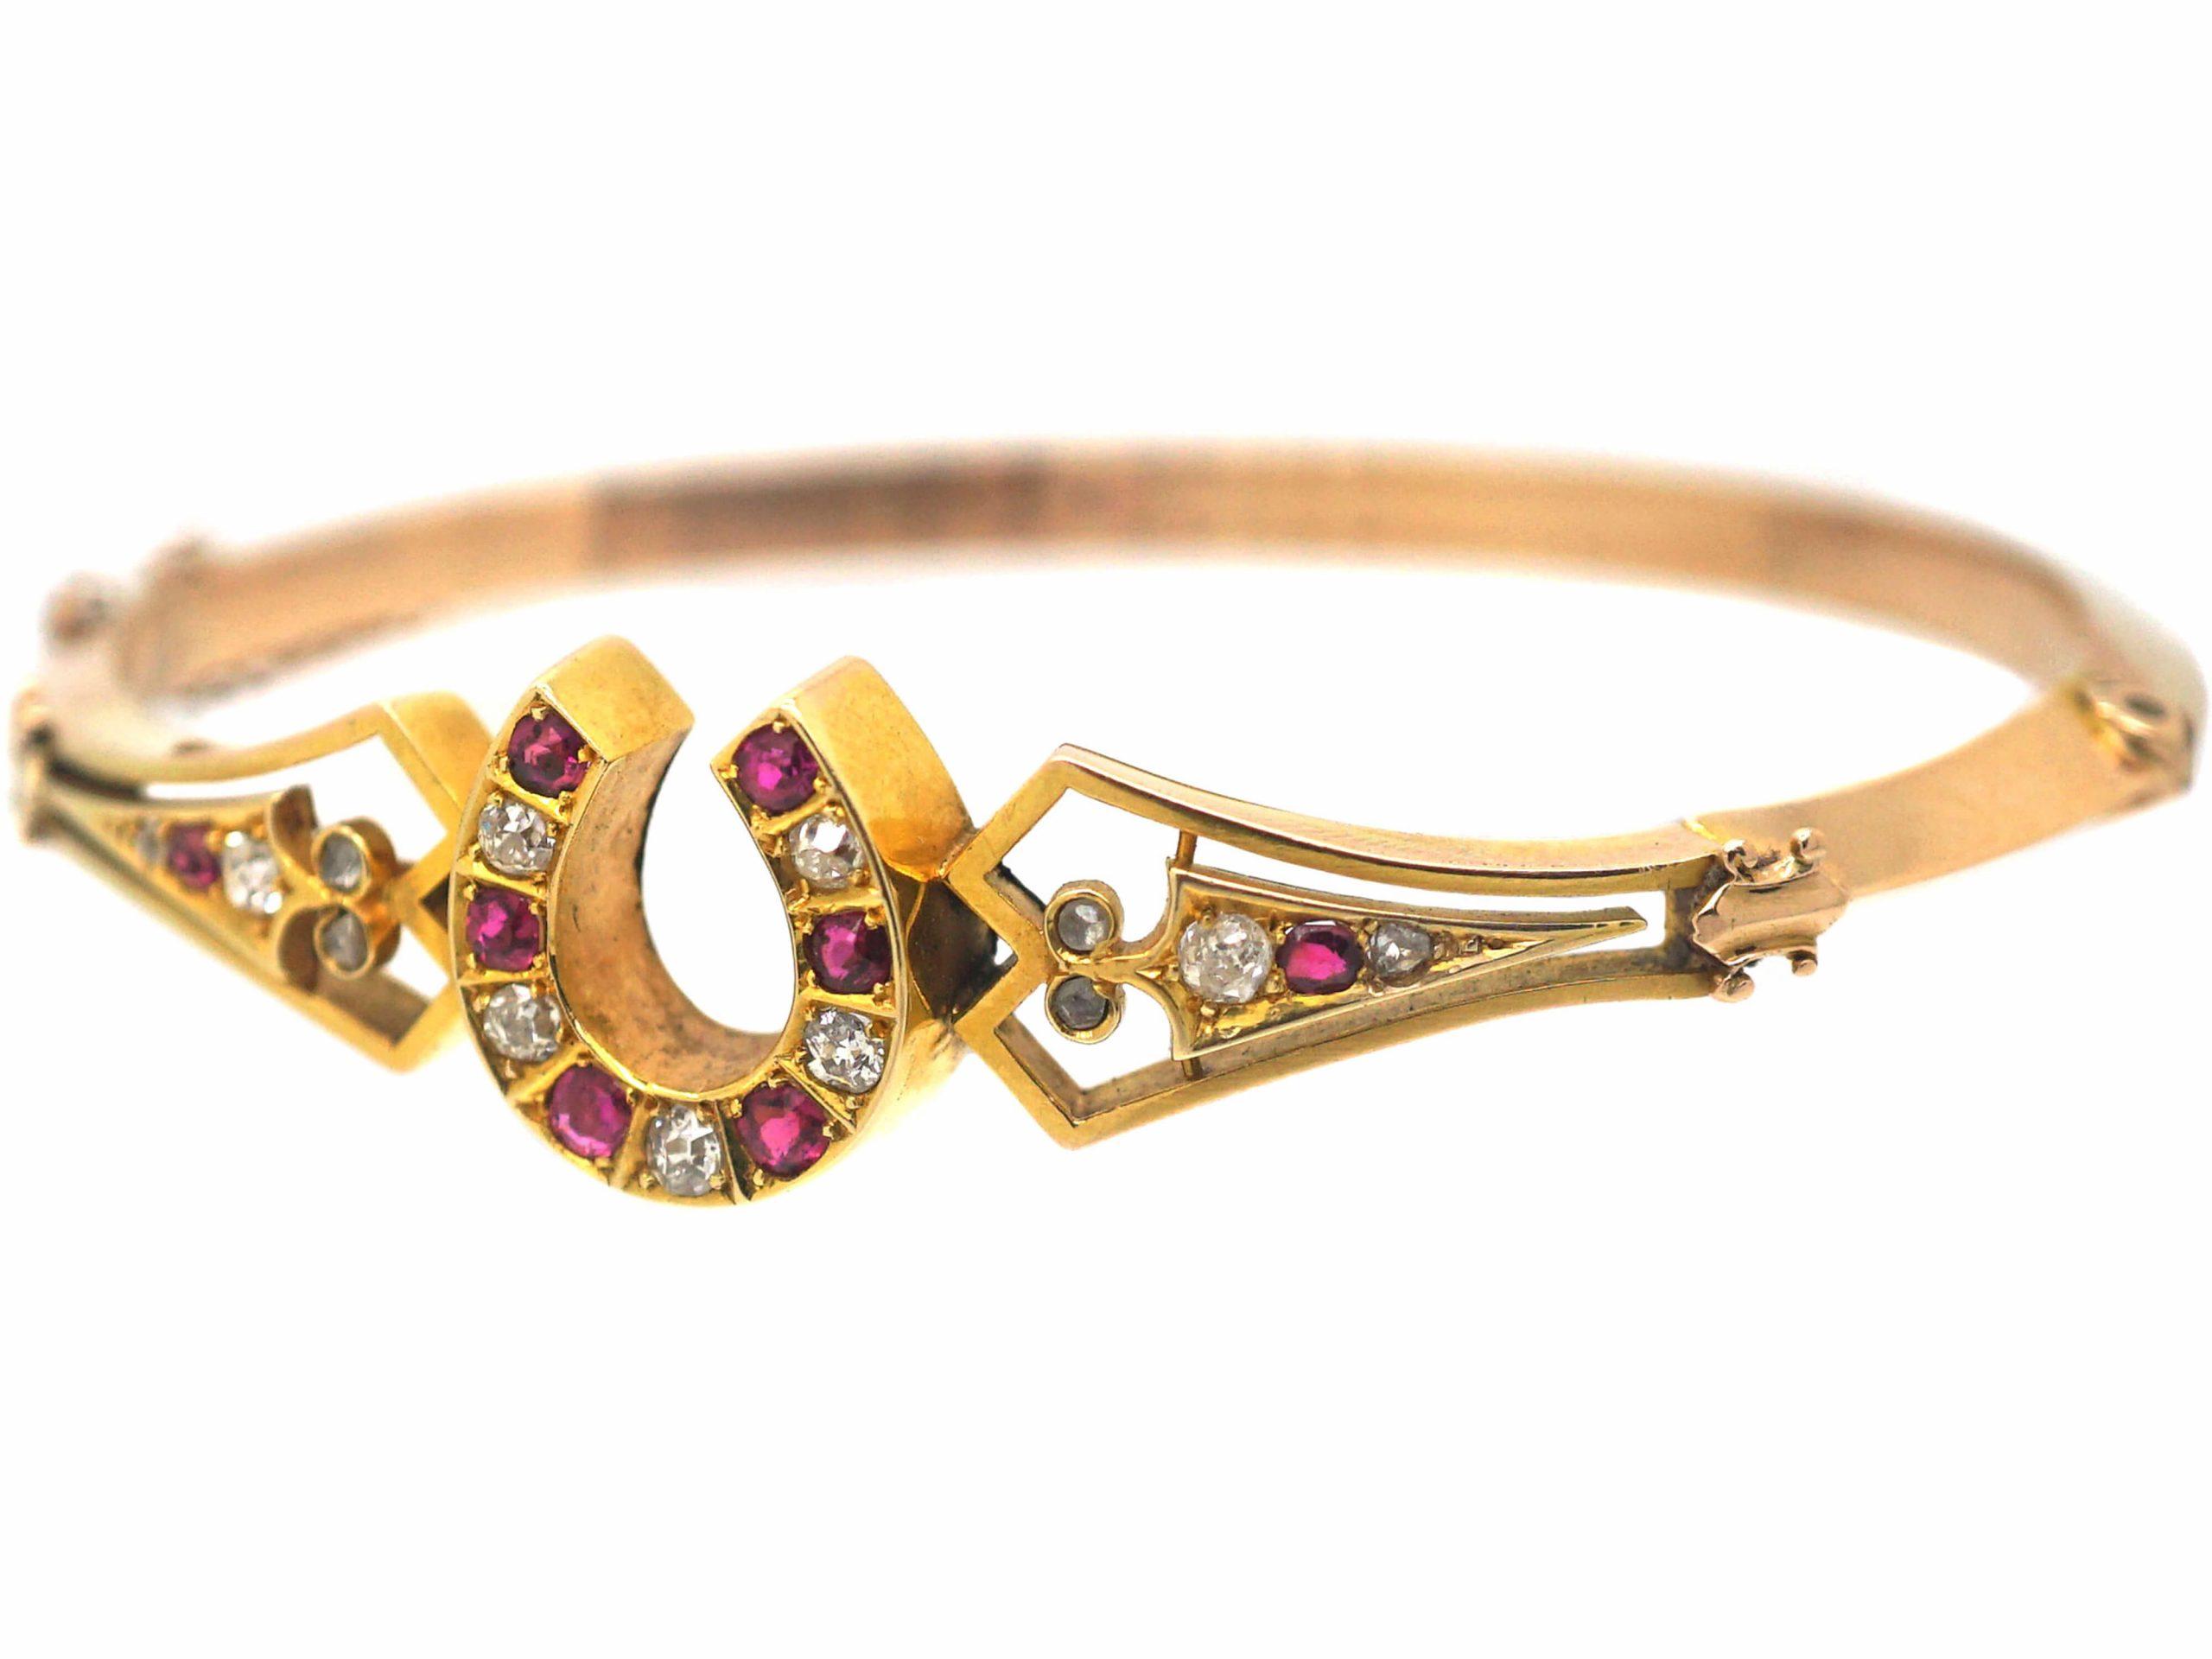 Victorian 15ct Gold, Ruby & Diamond Bangle with Horseshoe Motif